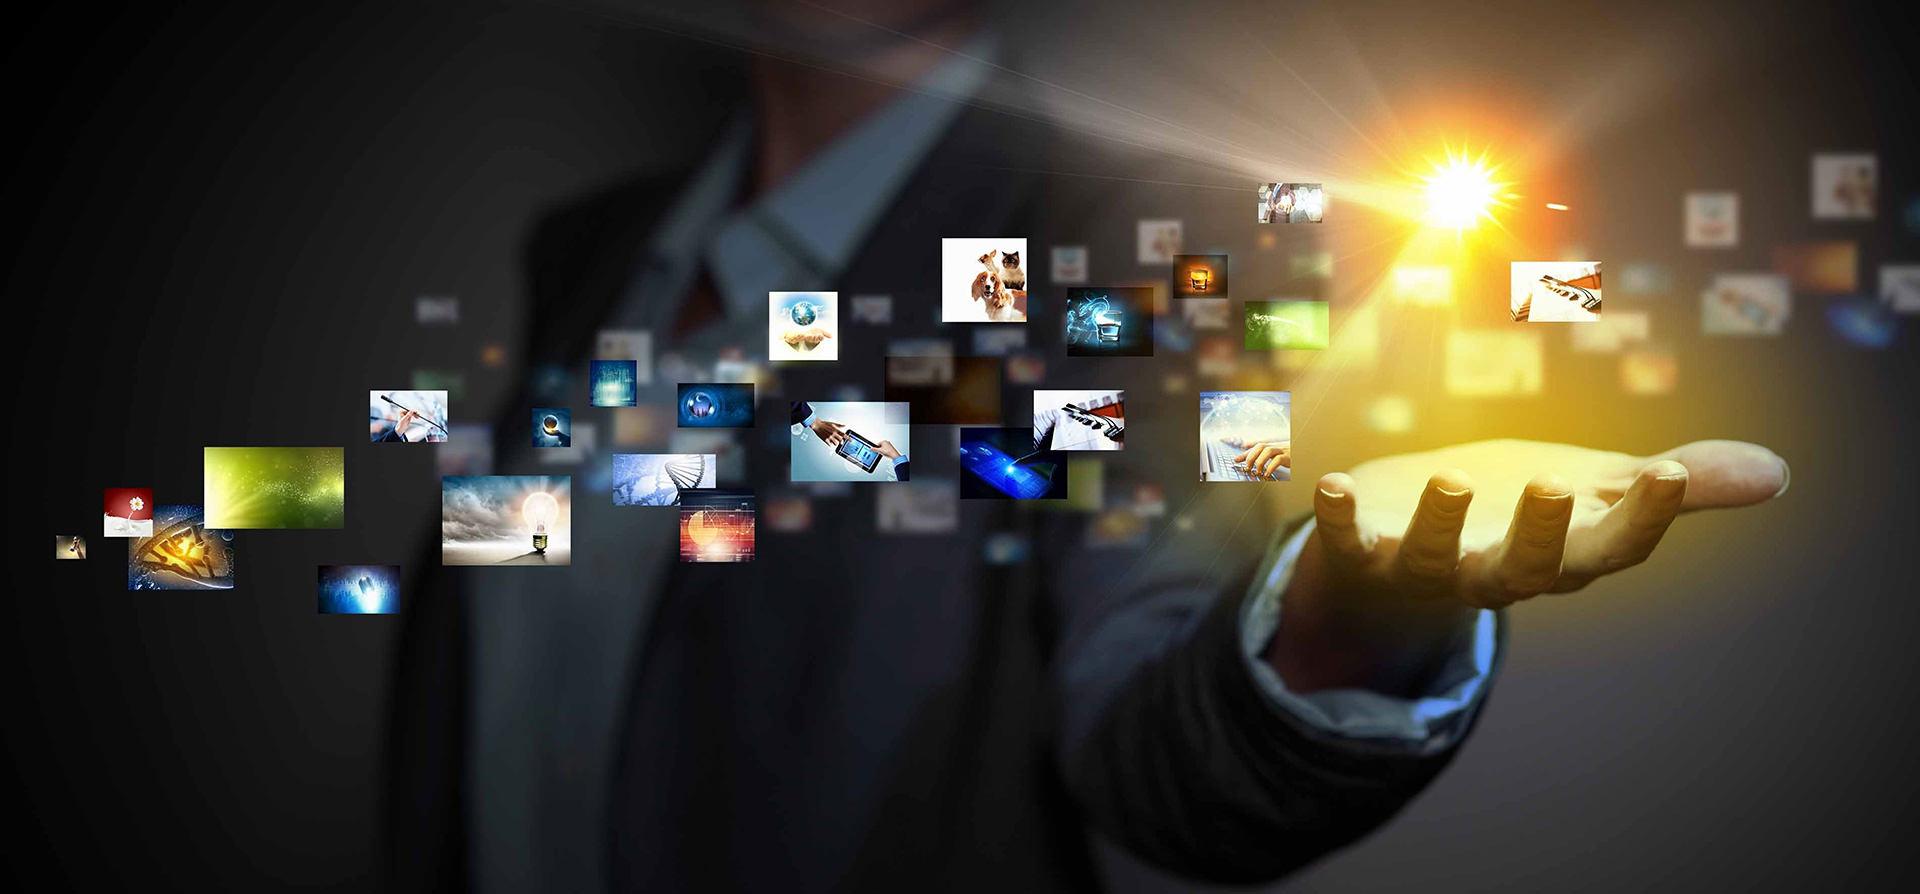 essere-nel-web-agenzia-marketing-best74 (1)